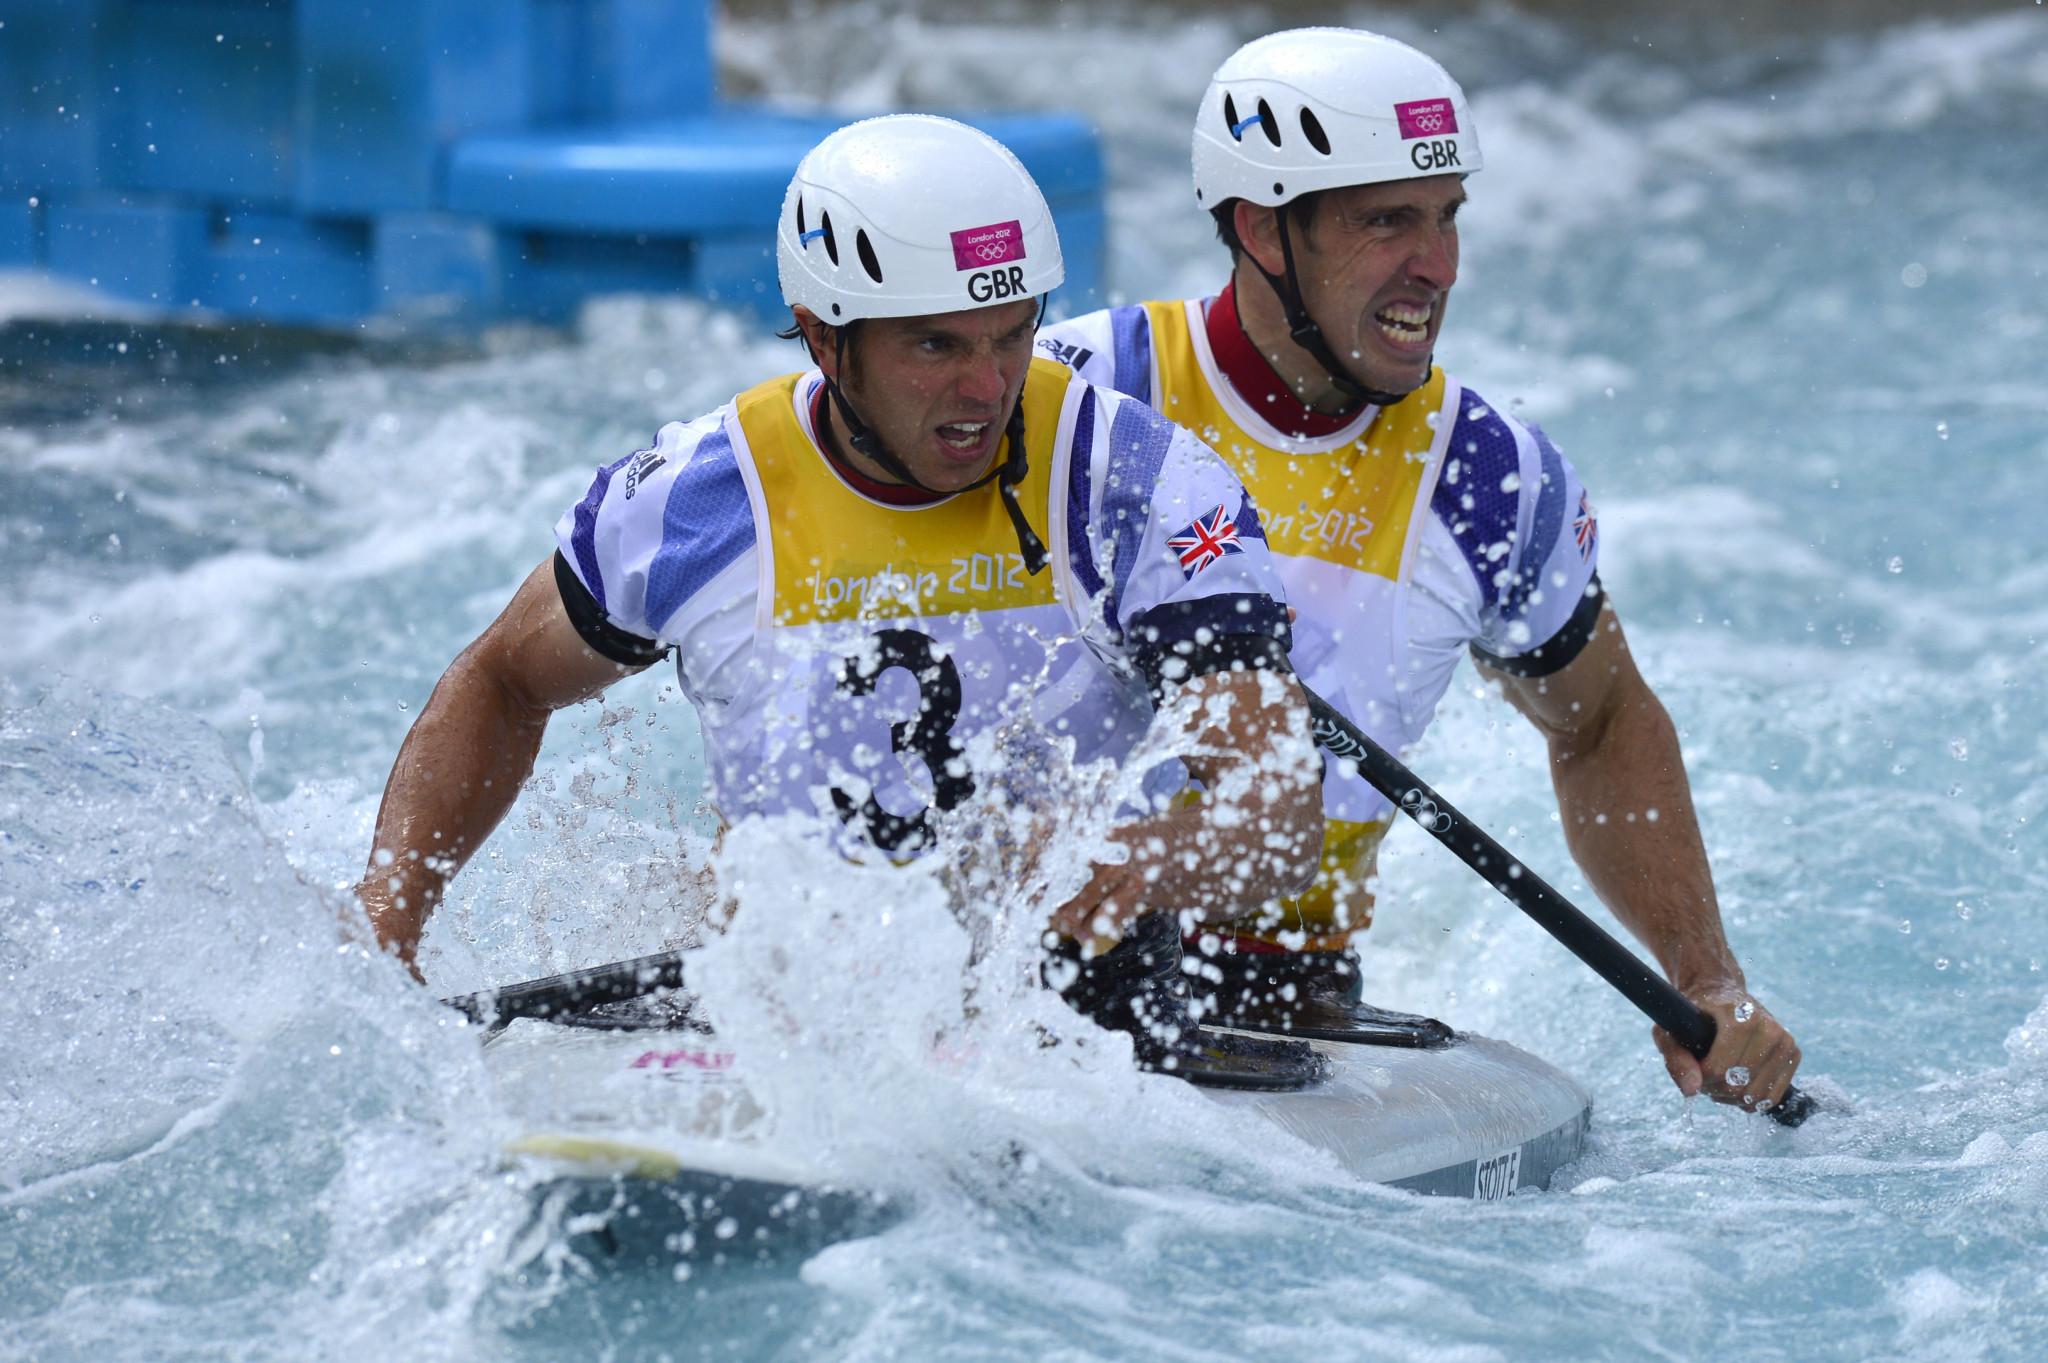 ECA Canoe Slalom European Championships cancelled due to coronavirus pandemic